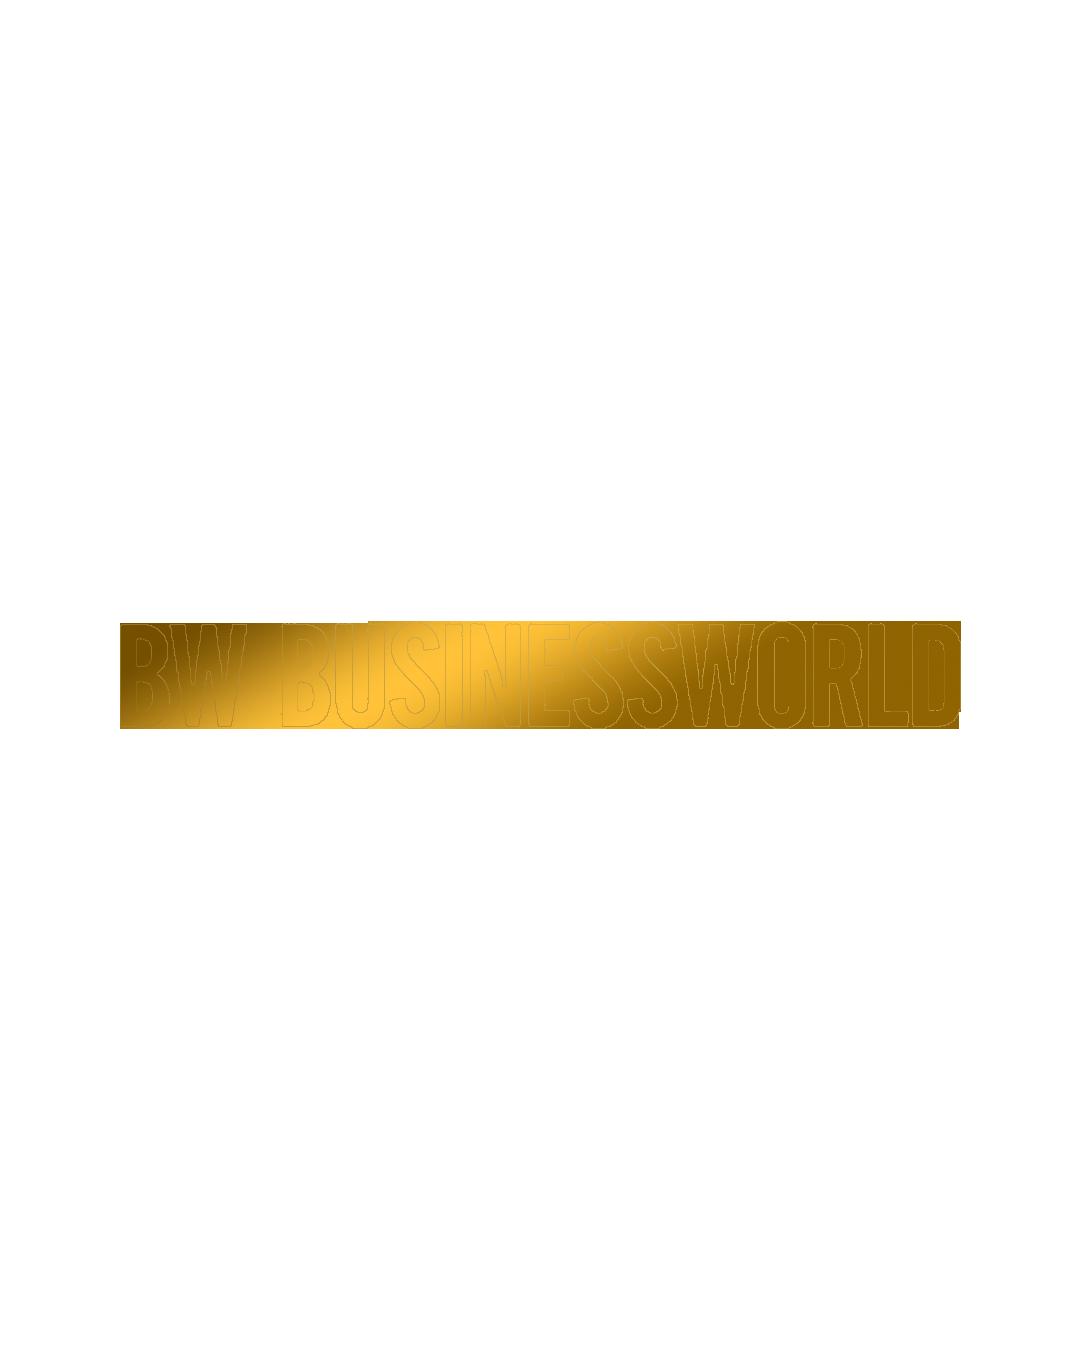 bussiness-world